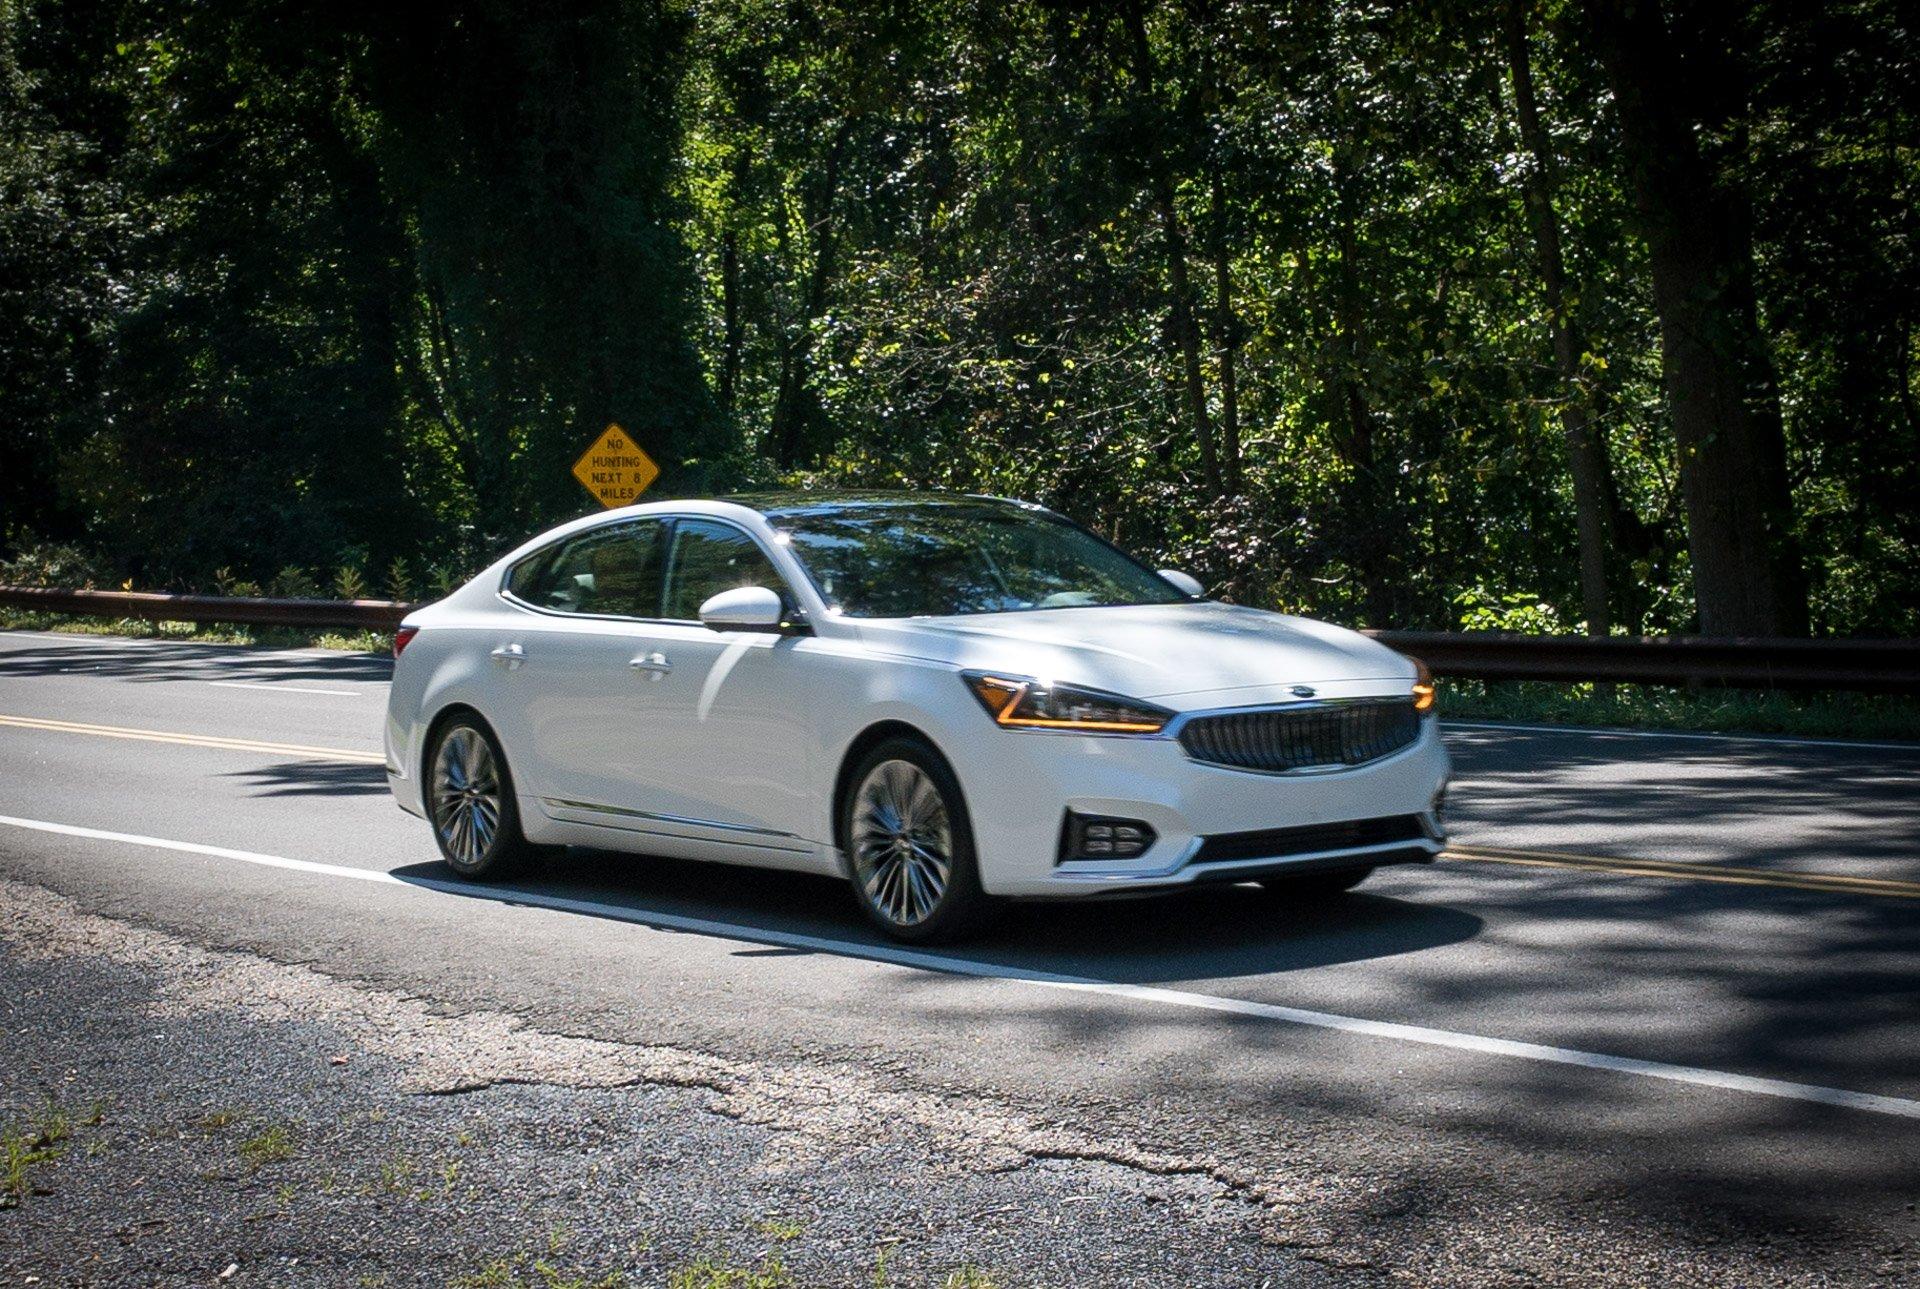 Innovative First Drive Review 2017 Kia Cadenza SXL  95 Octane